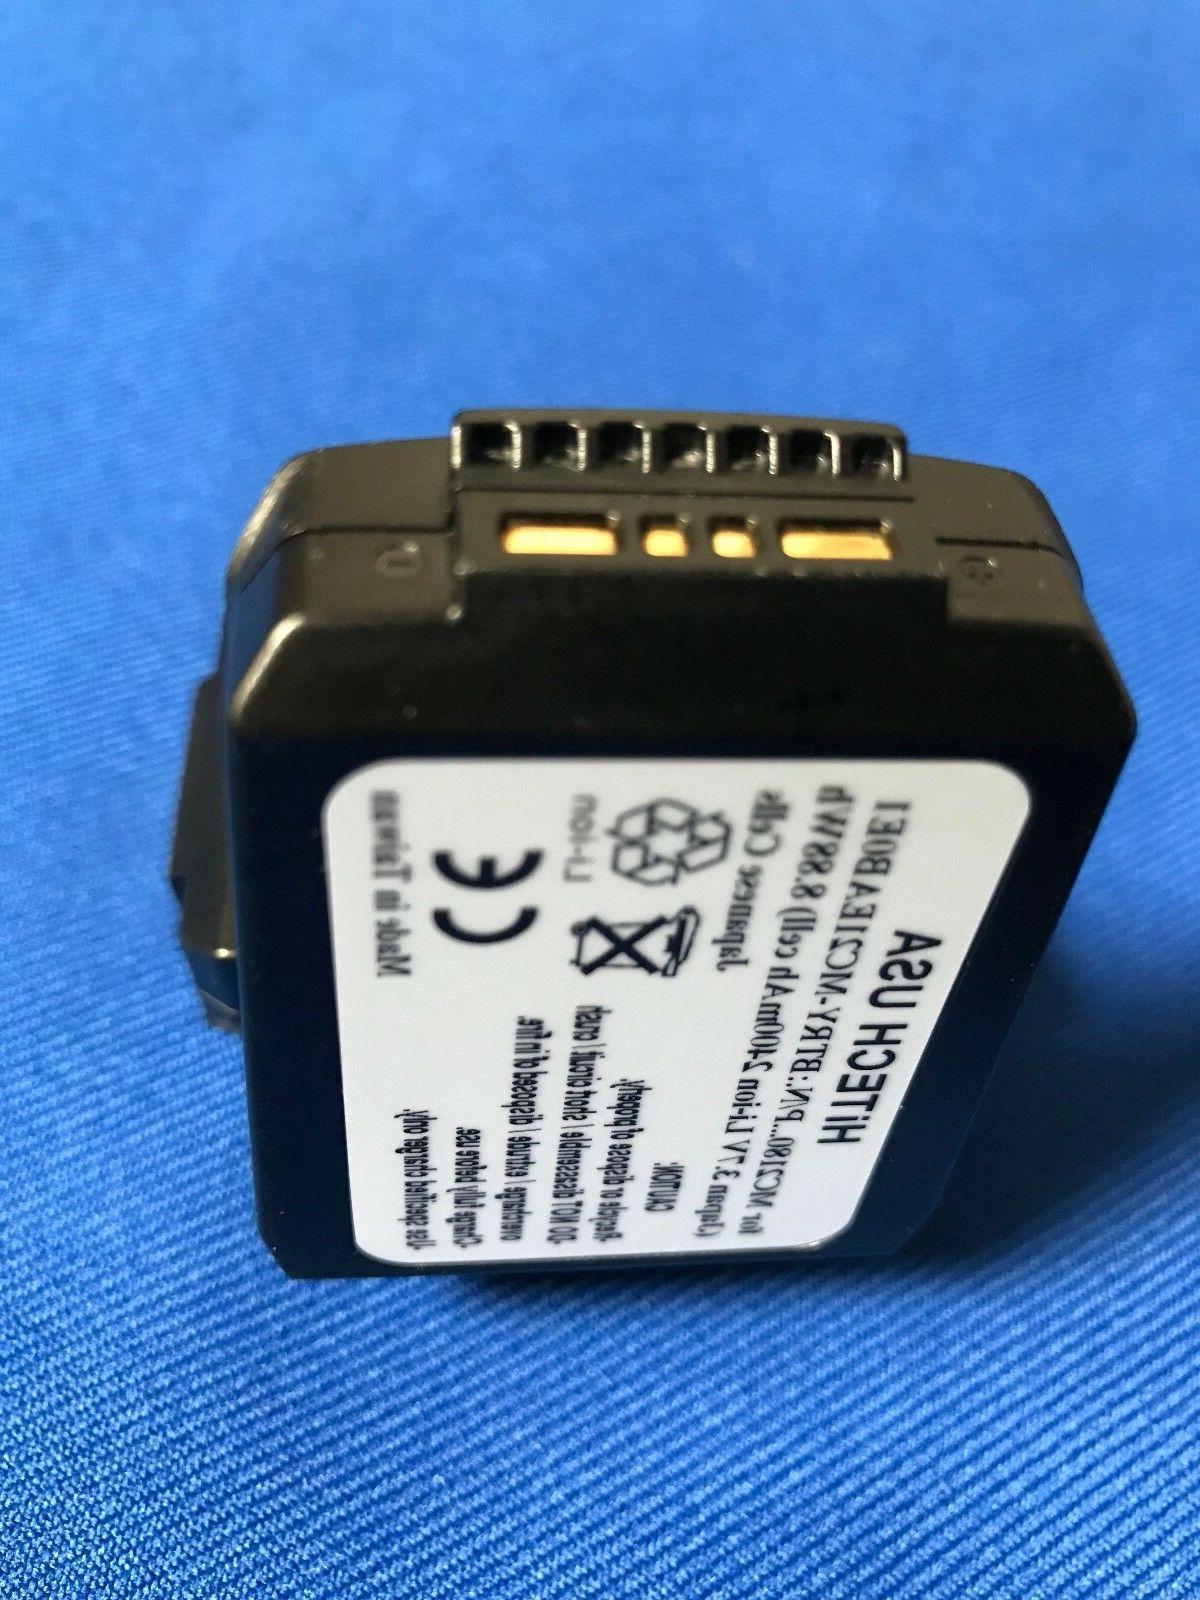 Hitech For Symbol MC2100 MT2070.MC2180.MC21xx #82-150612-01...eq